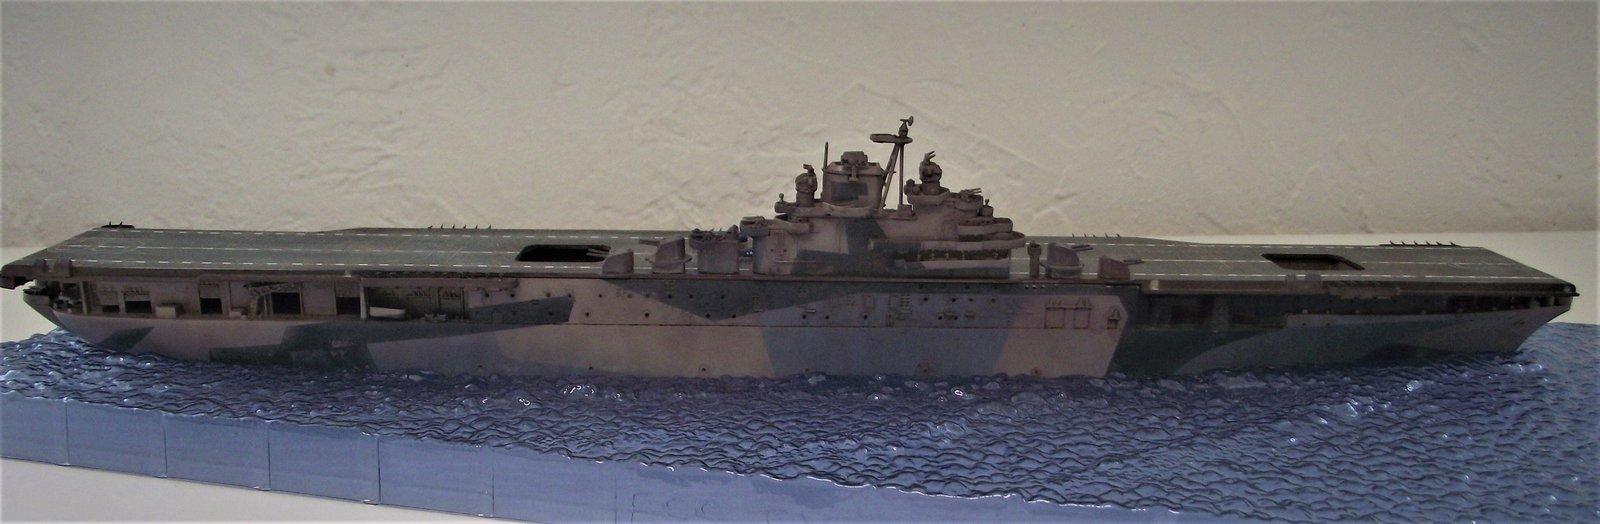 USS Hancok (Trumpeter 1/700°) 2106180100389636